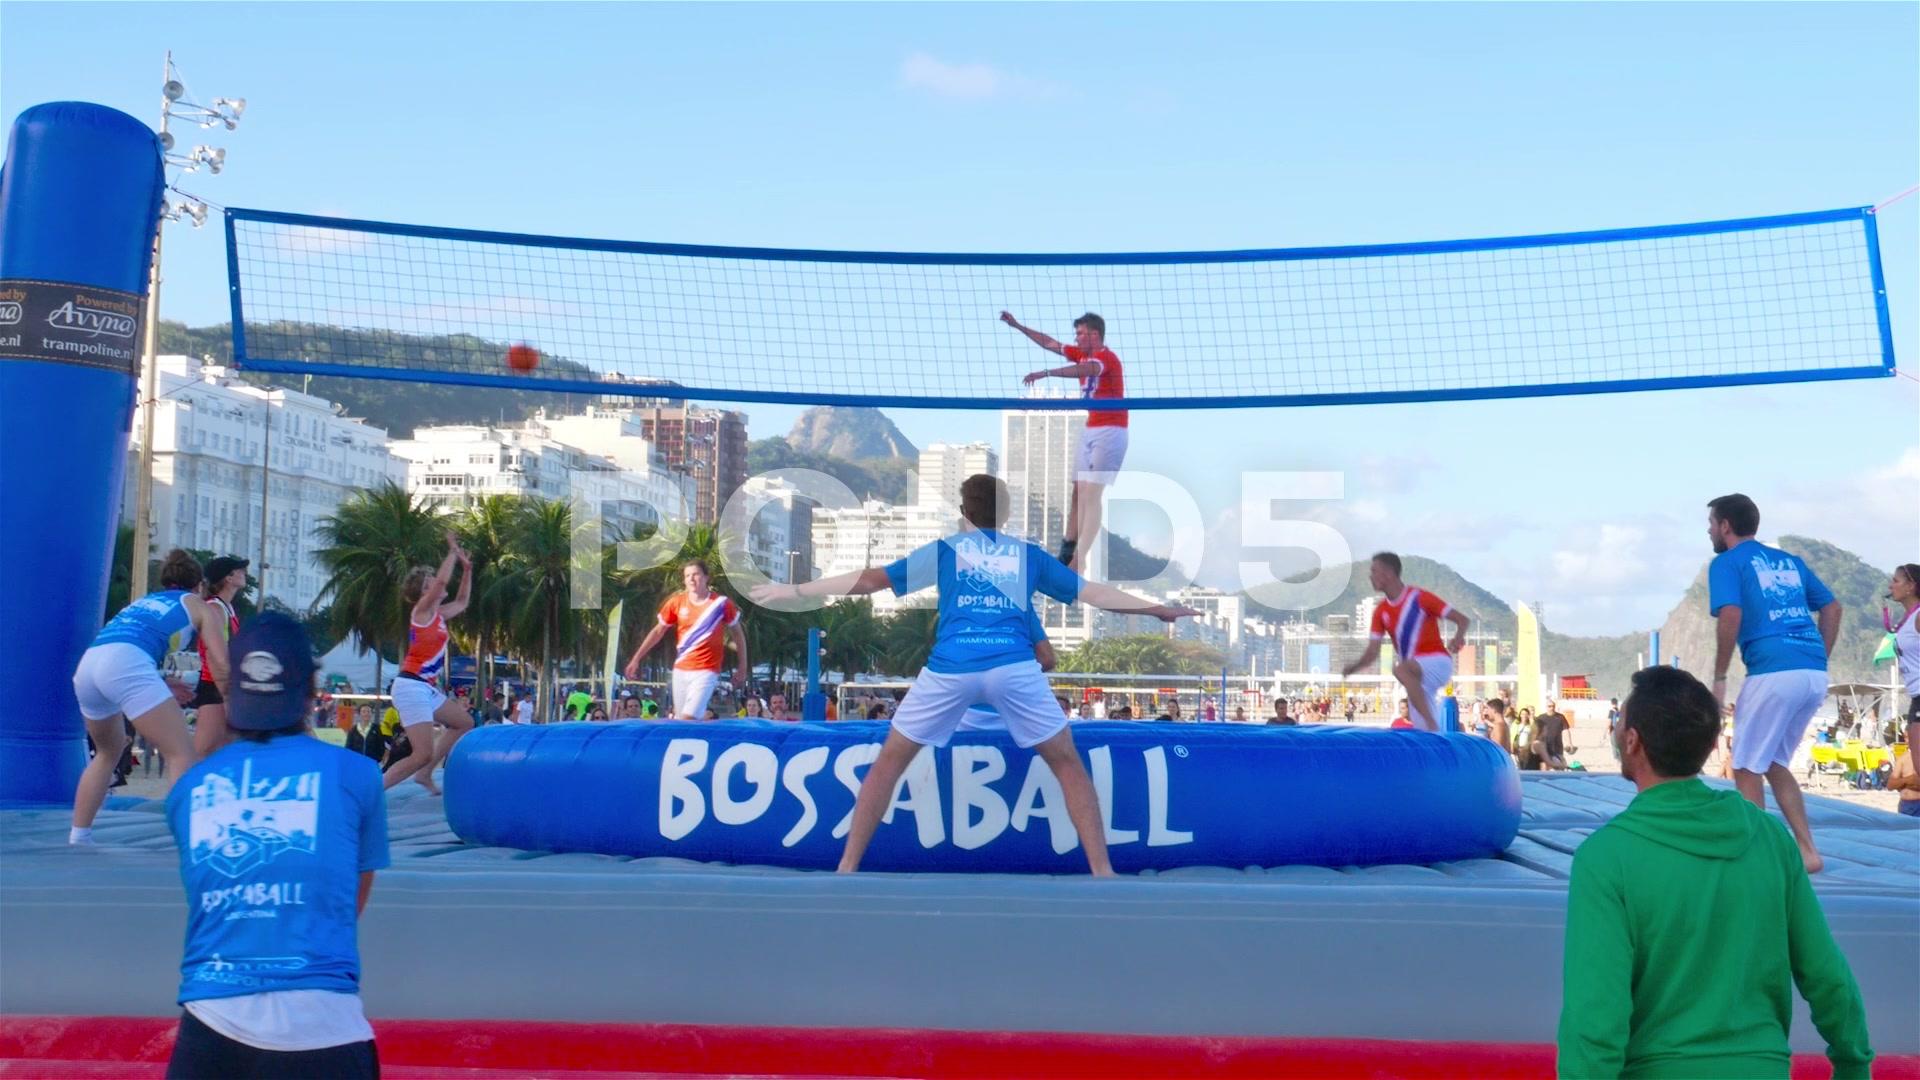 Bossaball Game HD 4K Stock Footage 67379193 Pond5 1920x1080